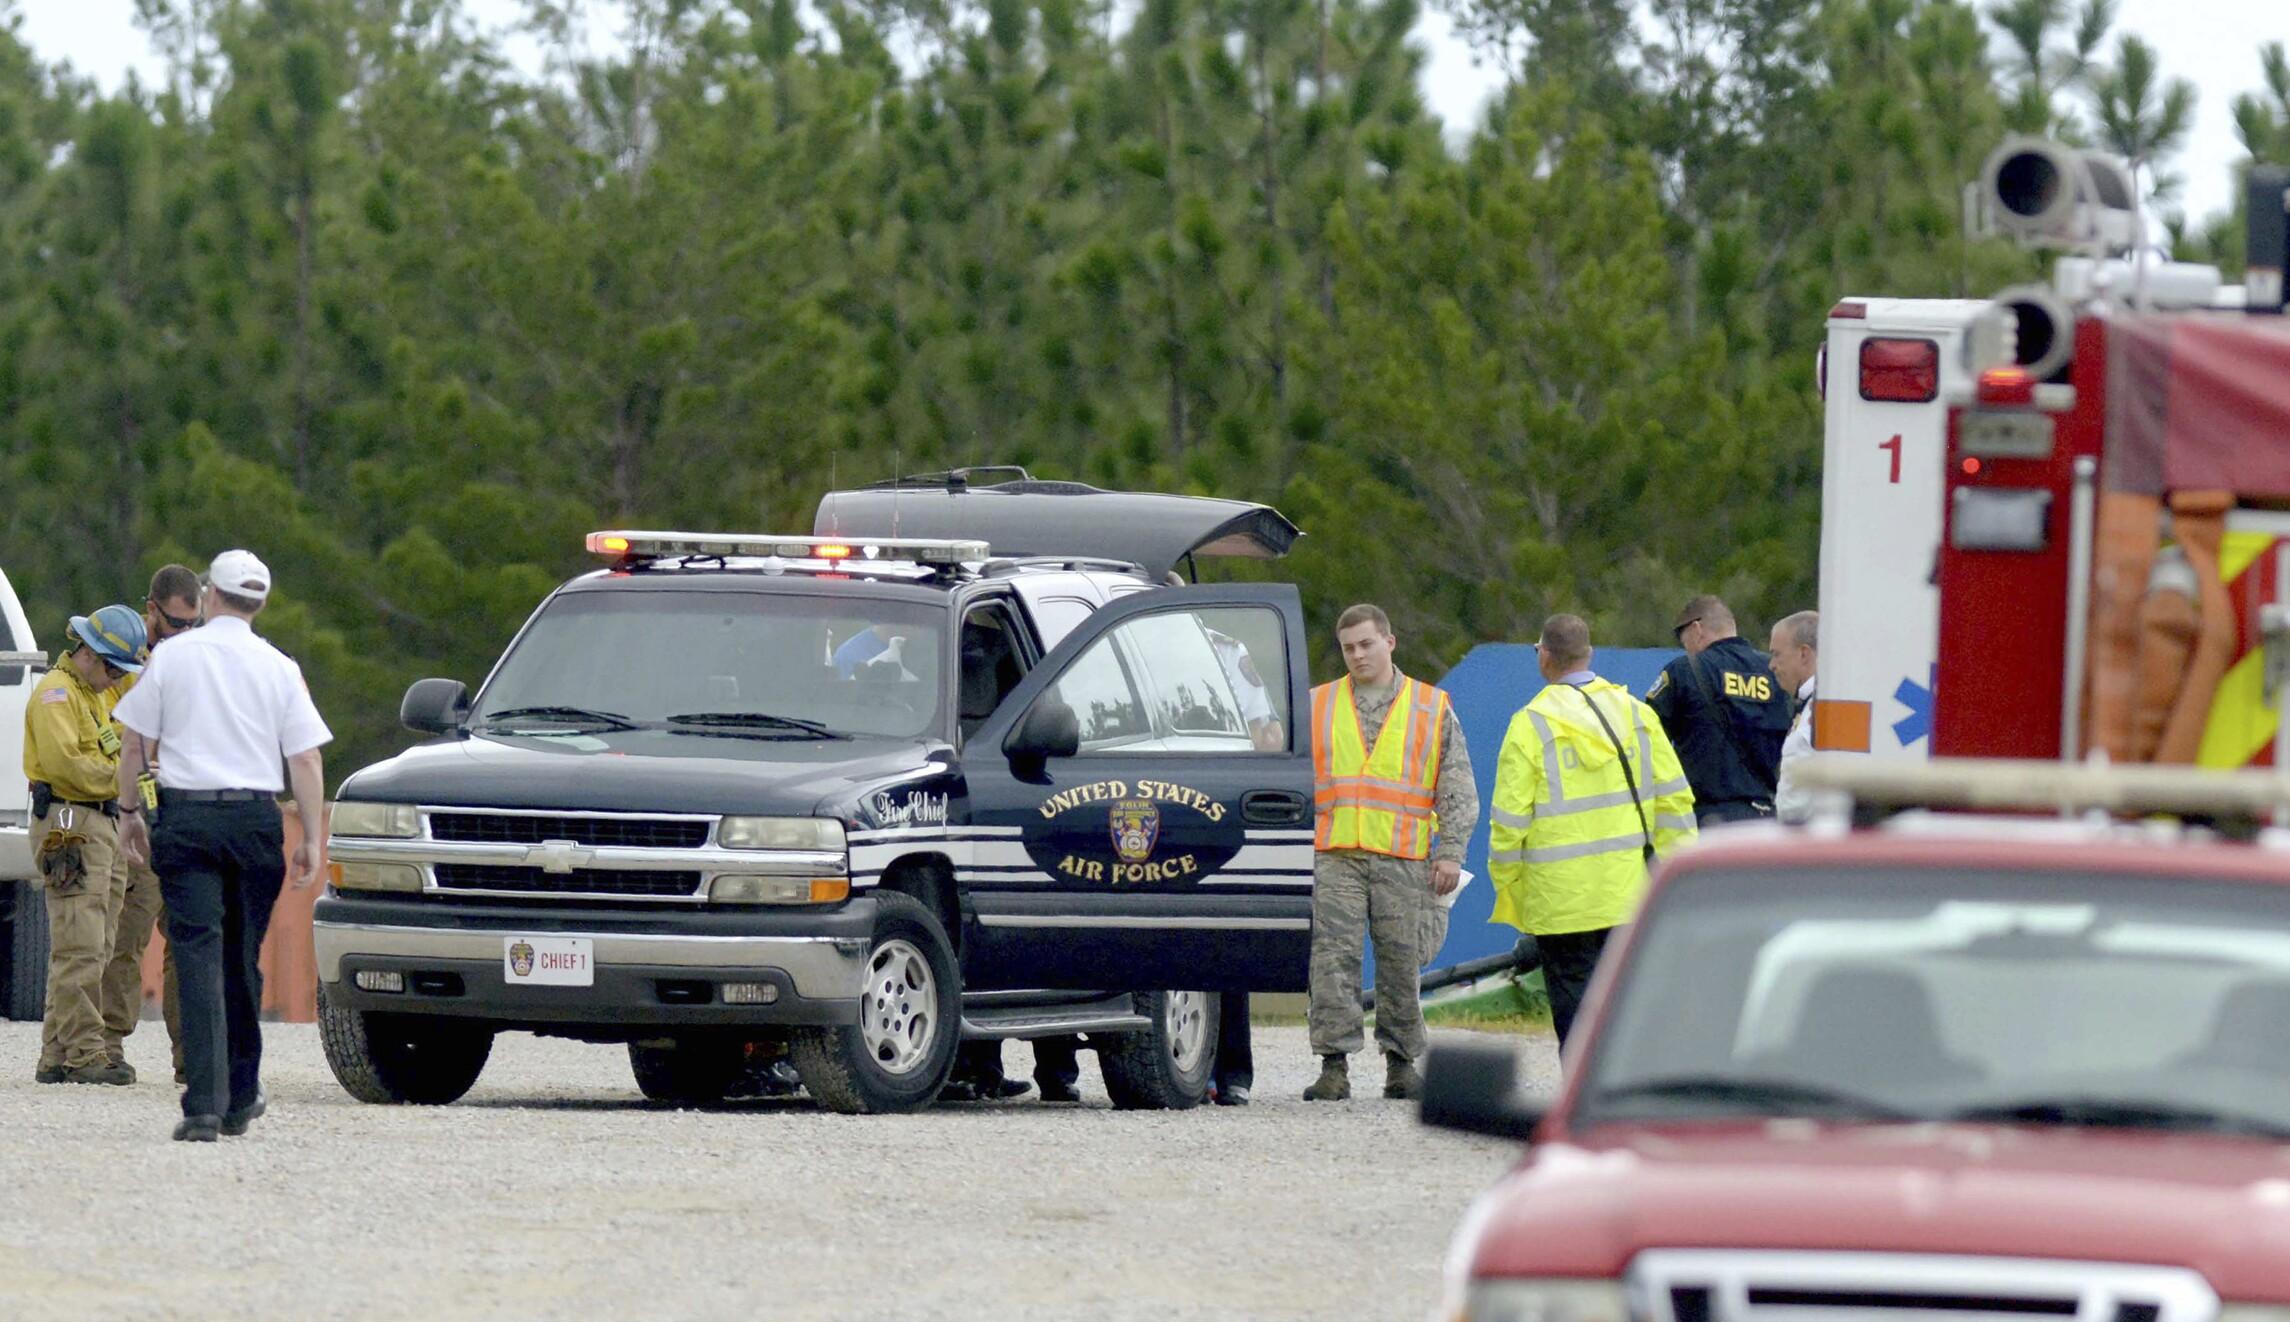 4 killed in civilian plane crash near Air Force base in Florida